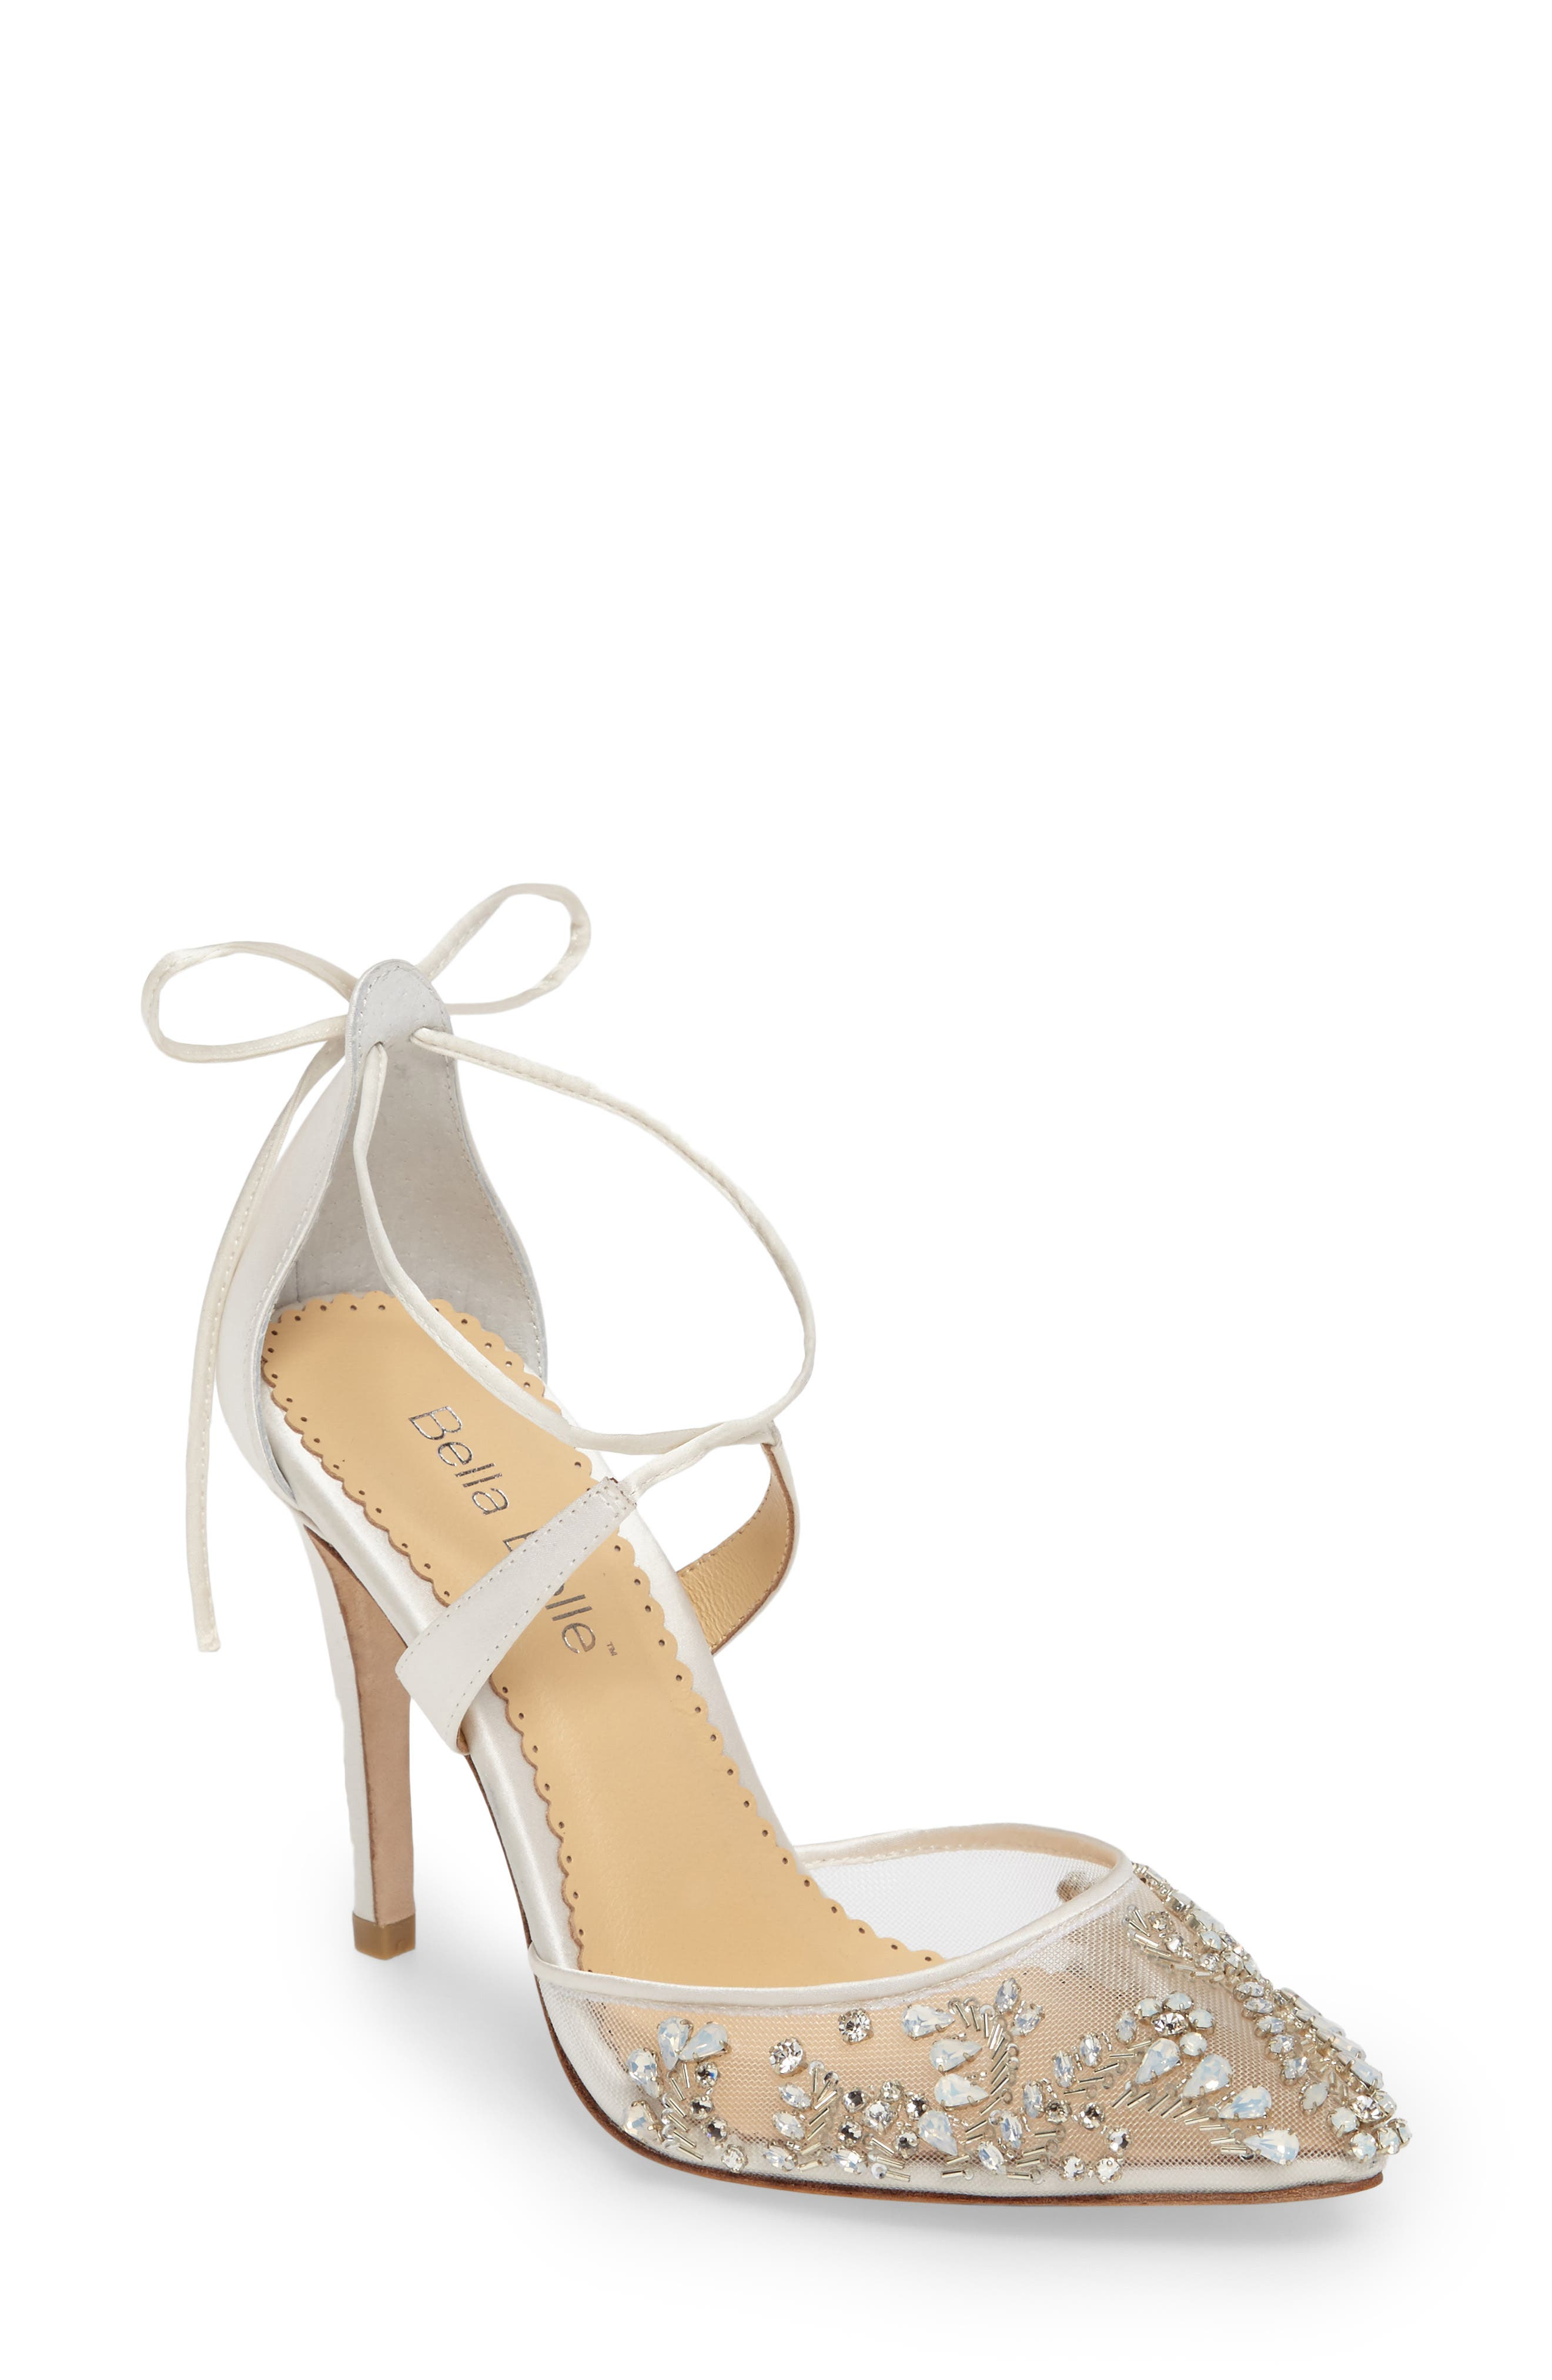 Florence Embellished Bow Sandal, Main, color, IVORY FABRIC